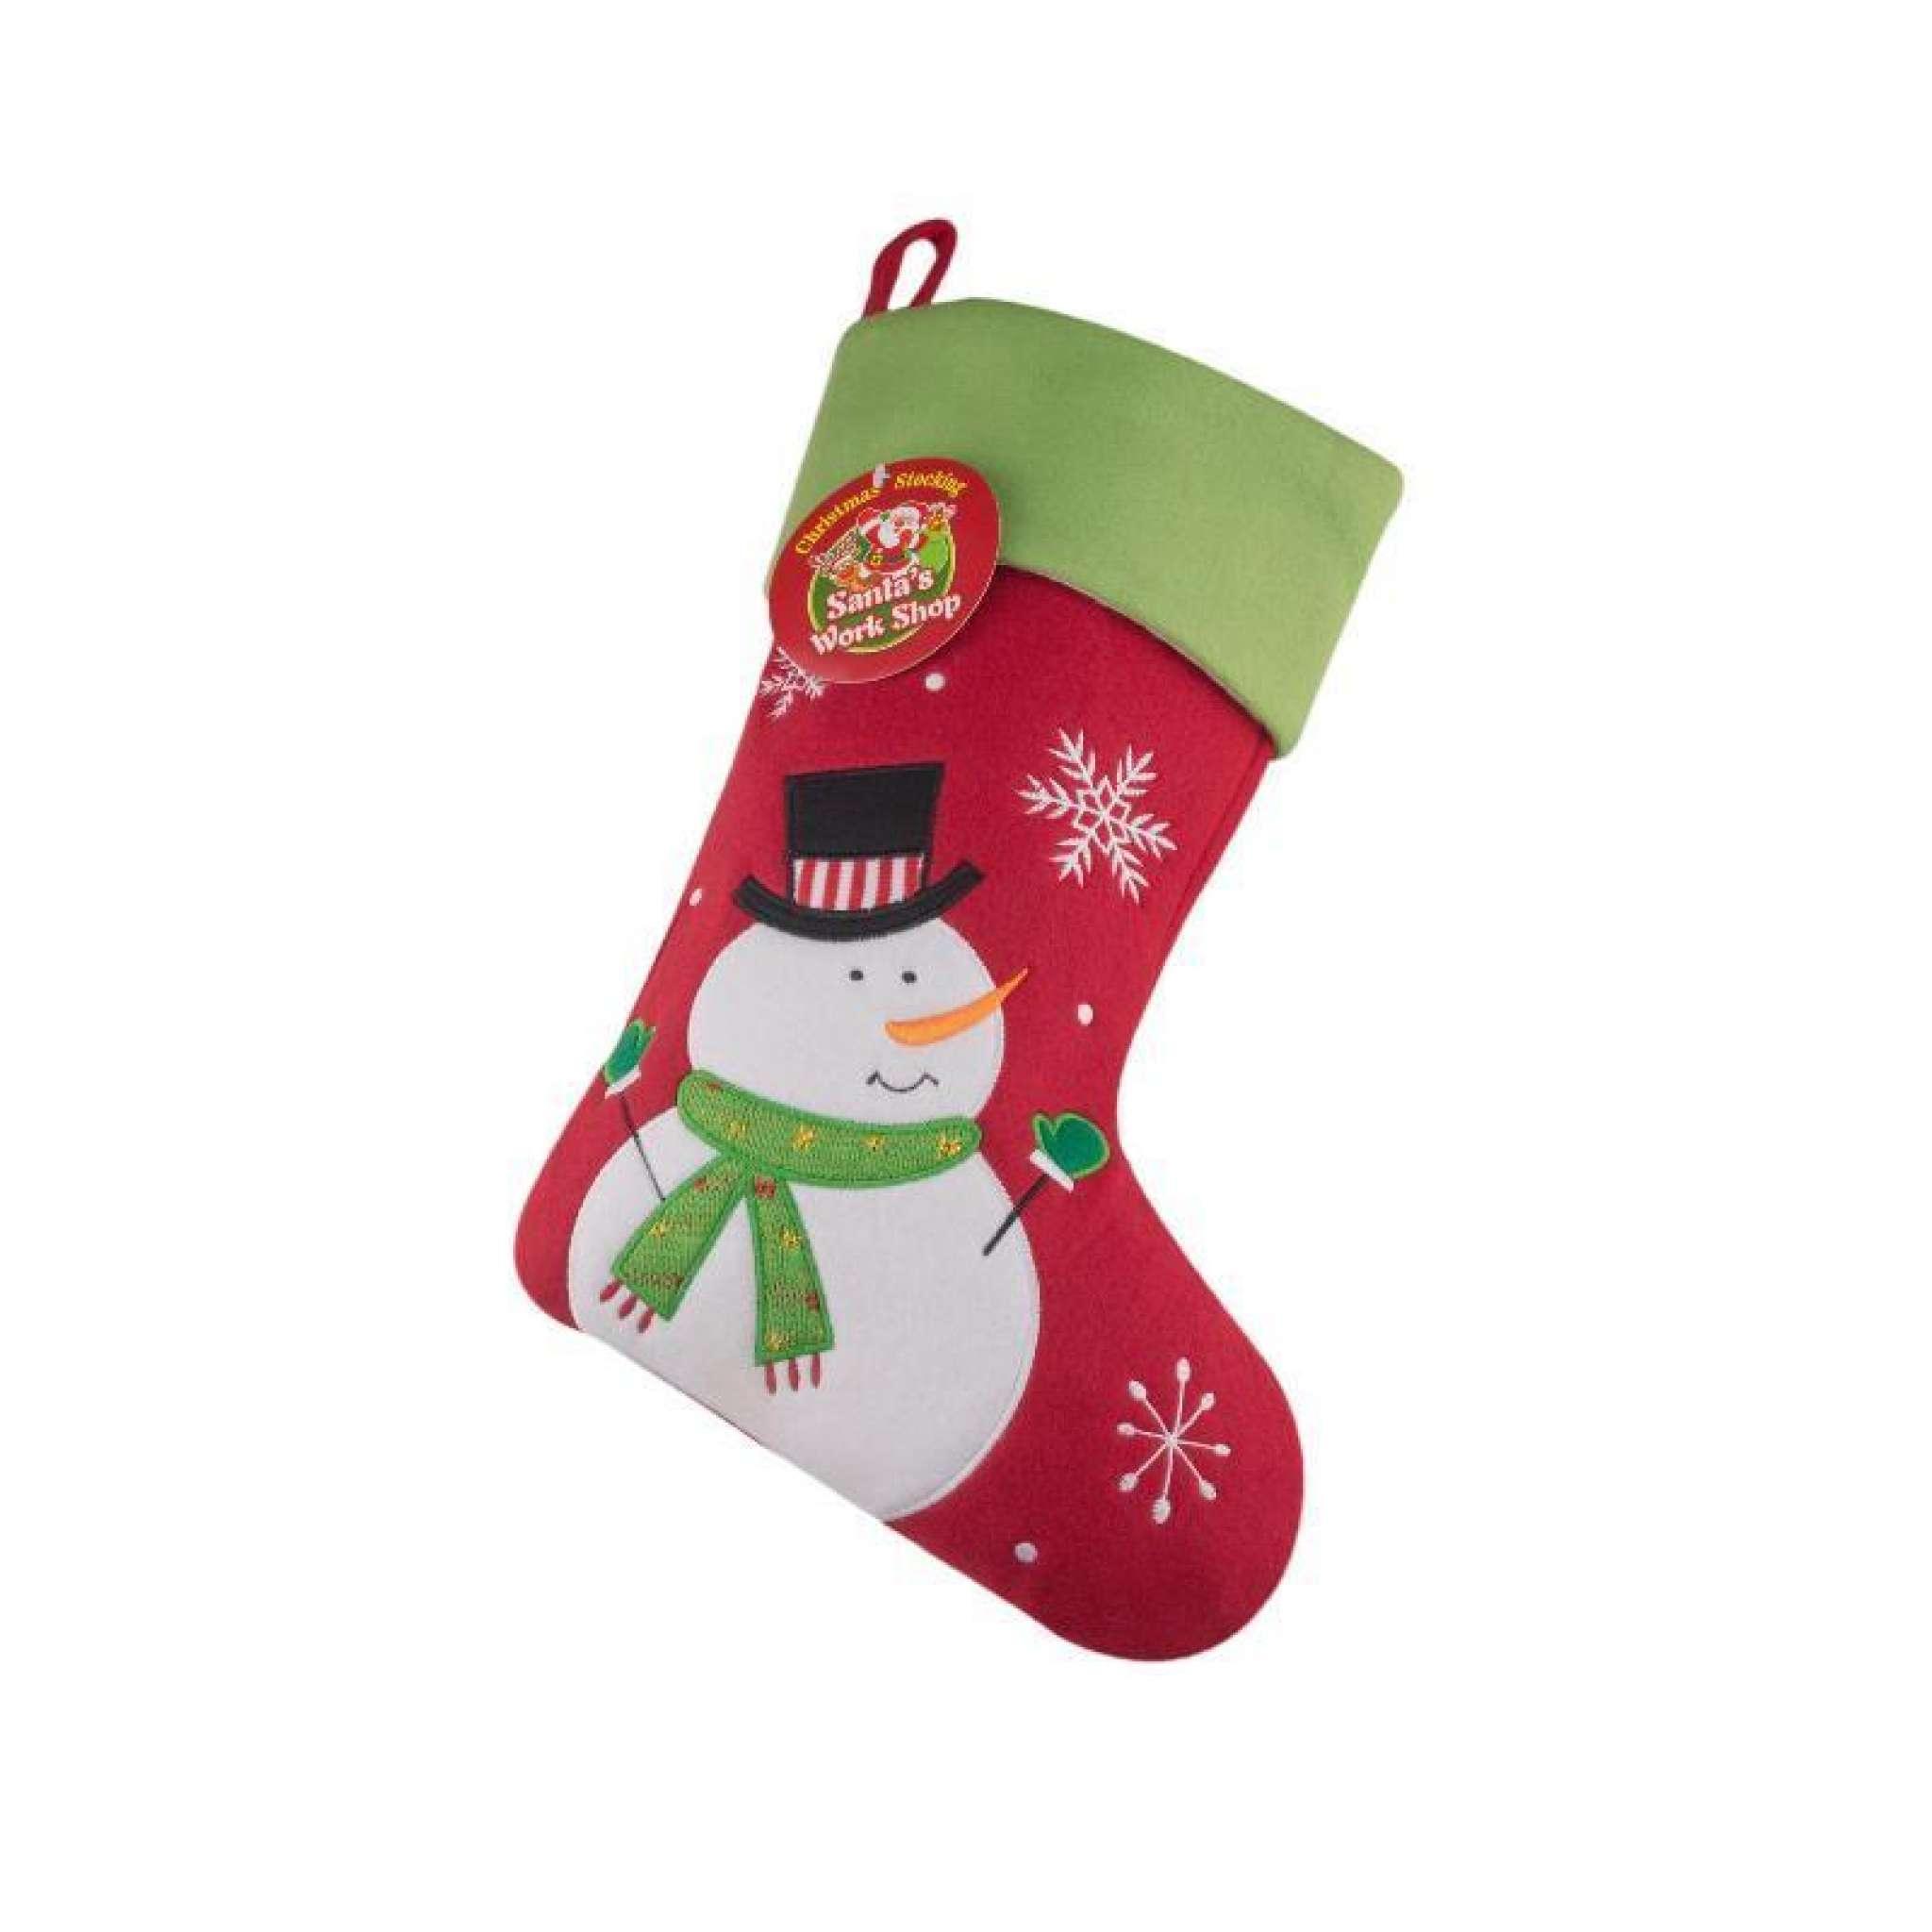 Julstrumpa Premium, Snögubbe Röd/Grön